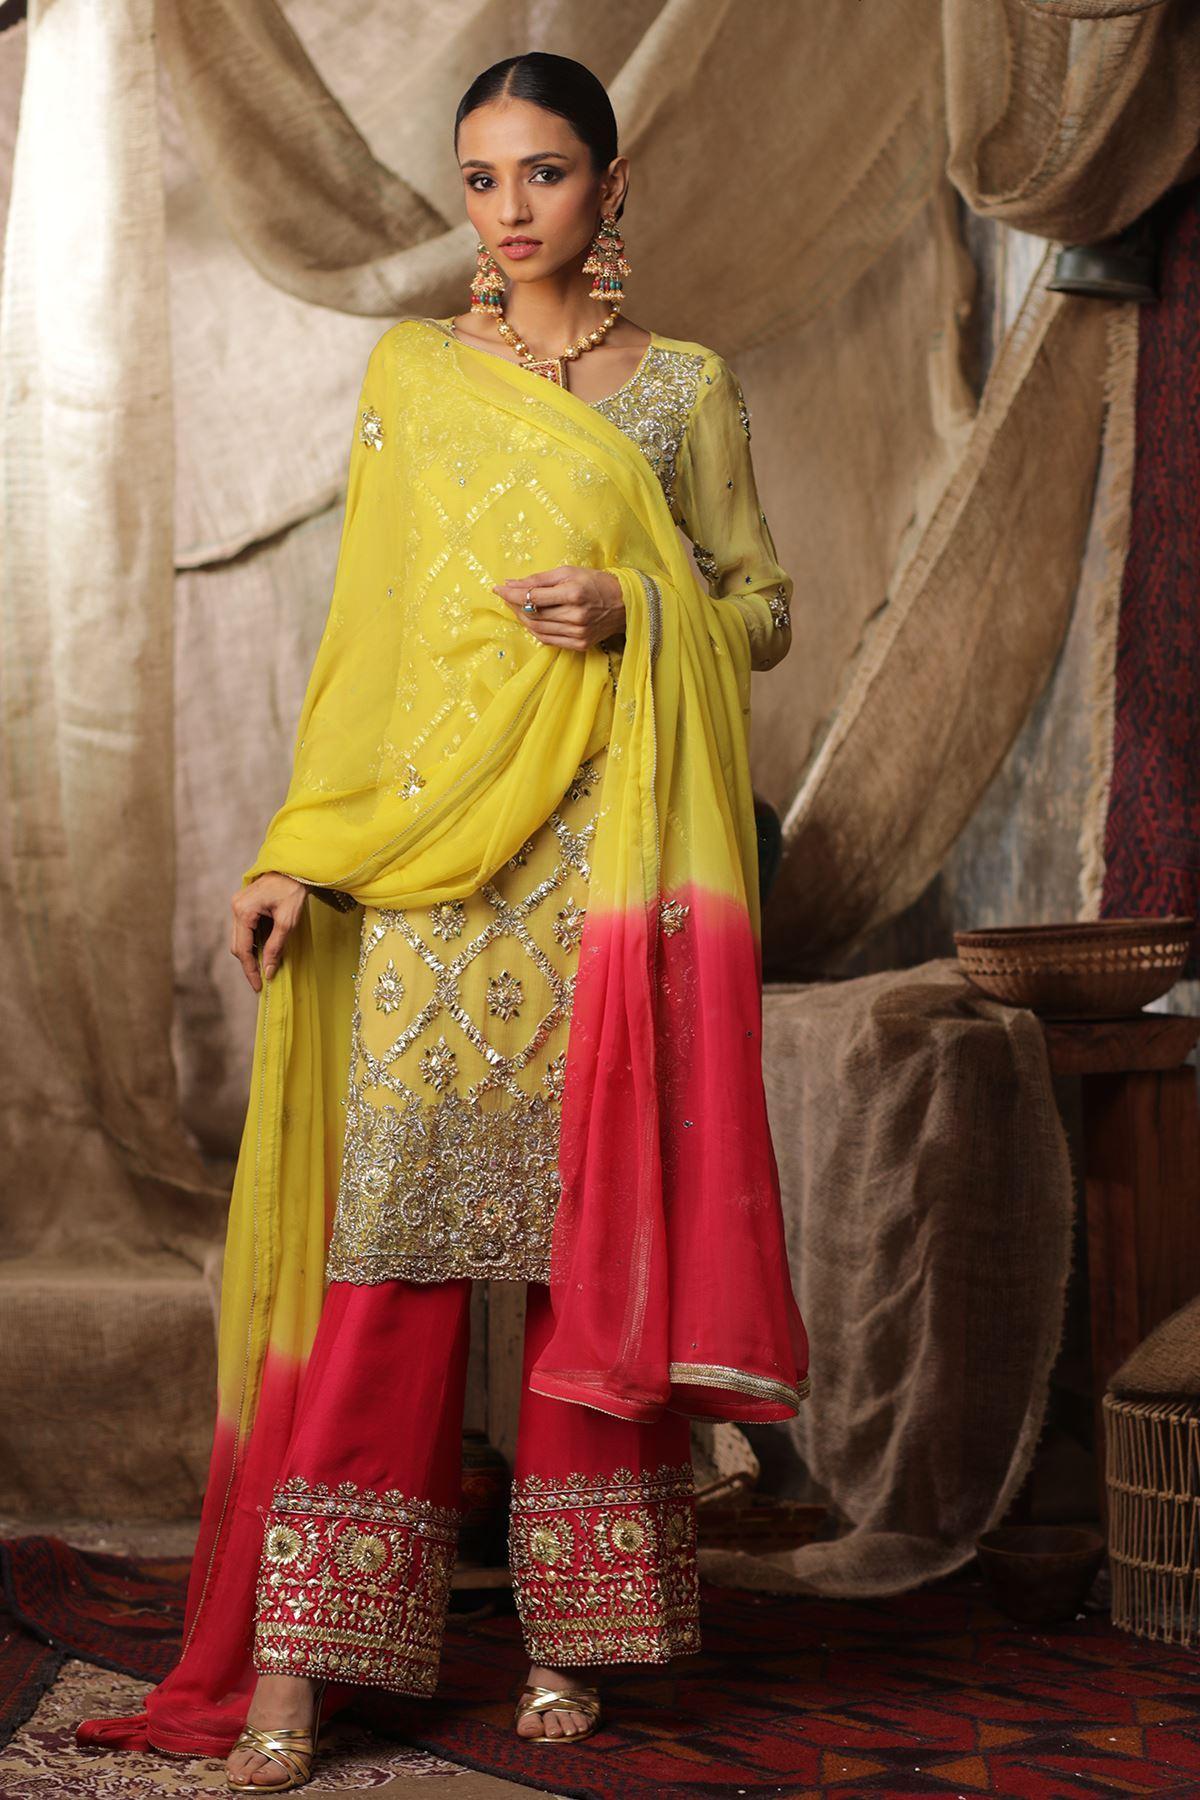 Moazzam Khan Party Wear 3PC Shirt Trouser Dupatta in Mehndi for Women